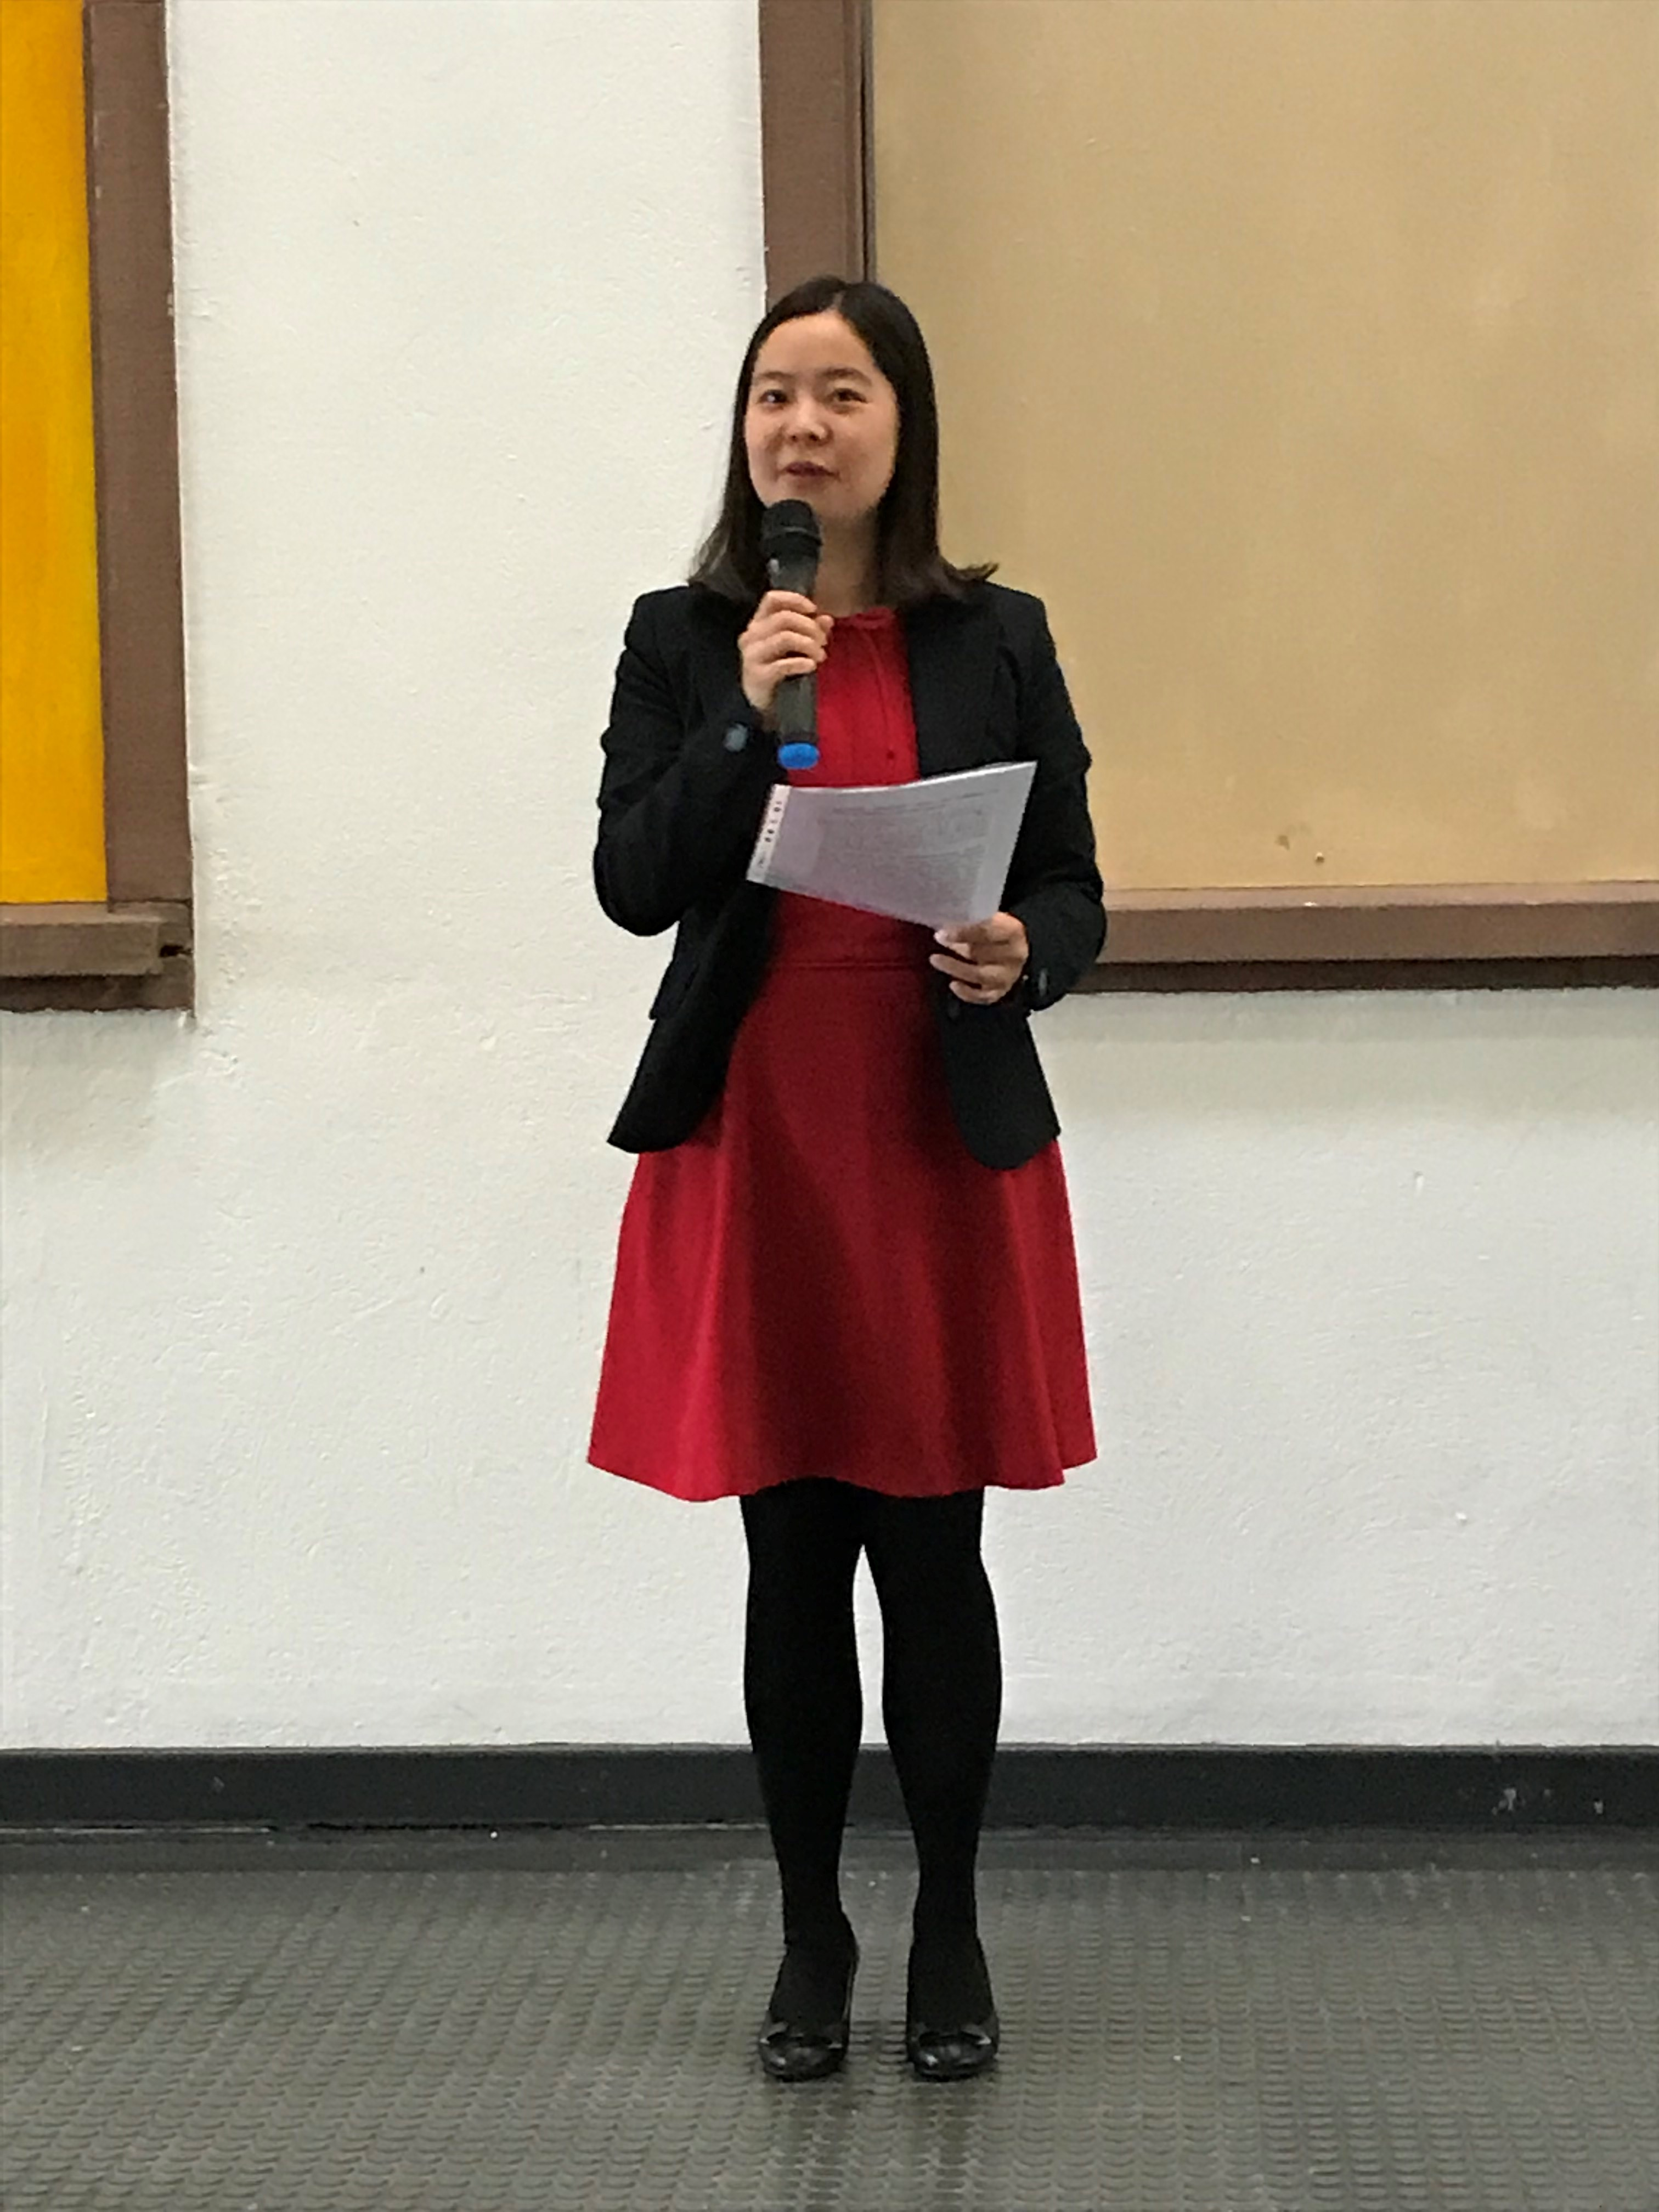 Die Grüße von Generalkonsul SUN überbringt Frau Konsulin LIU Yuanyuan